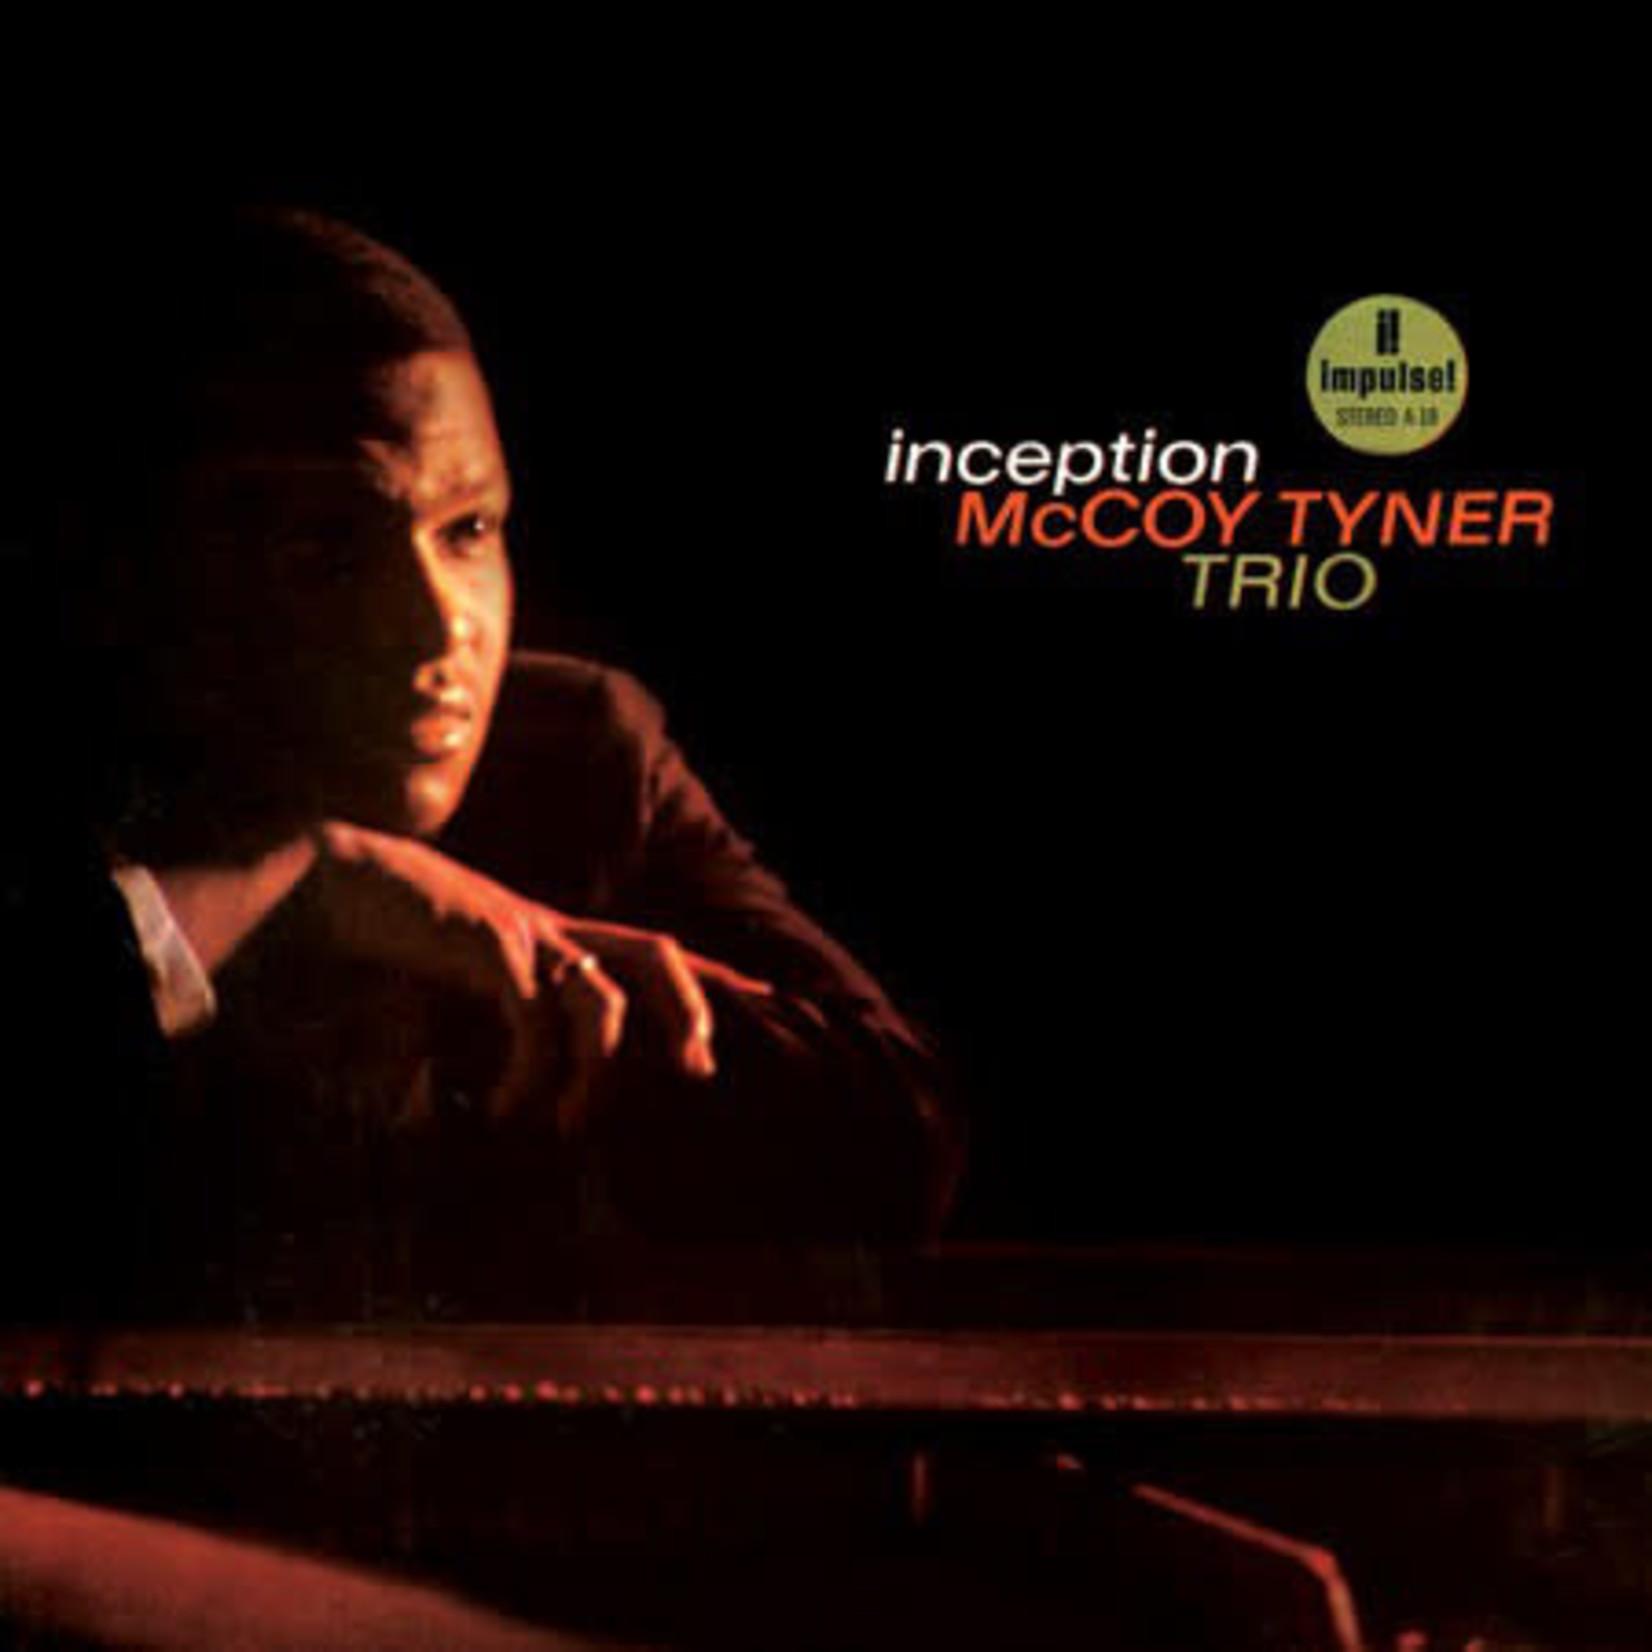 [New] Tyner, Mccoy: Inception (Vital Vinyl Series)